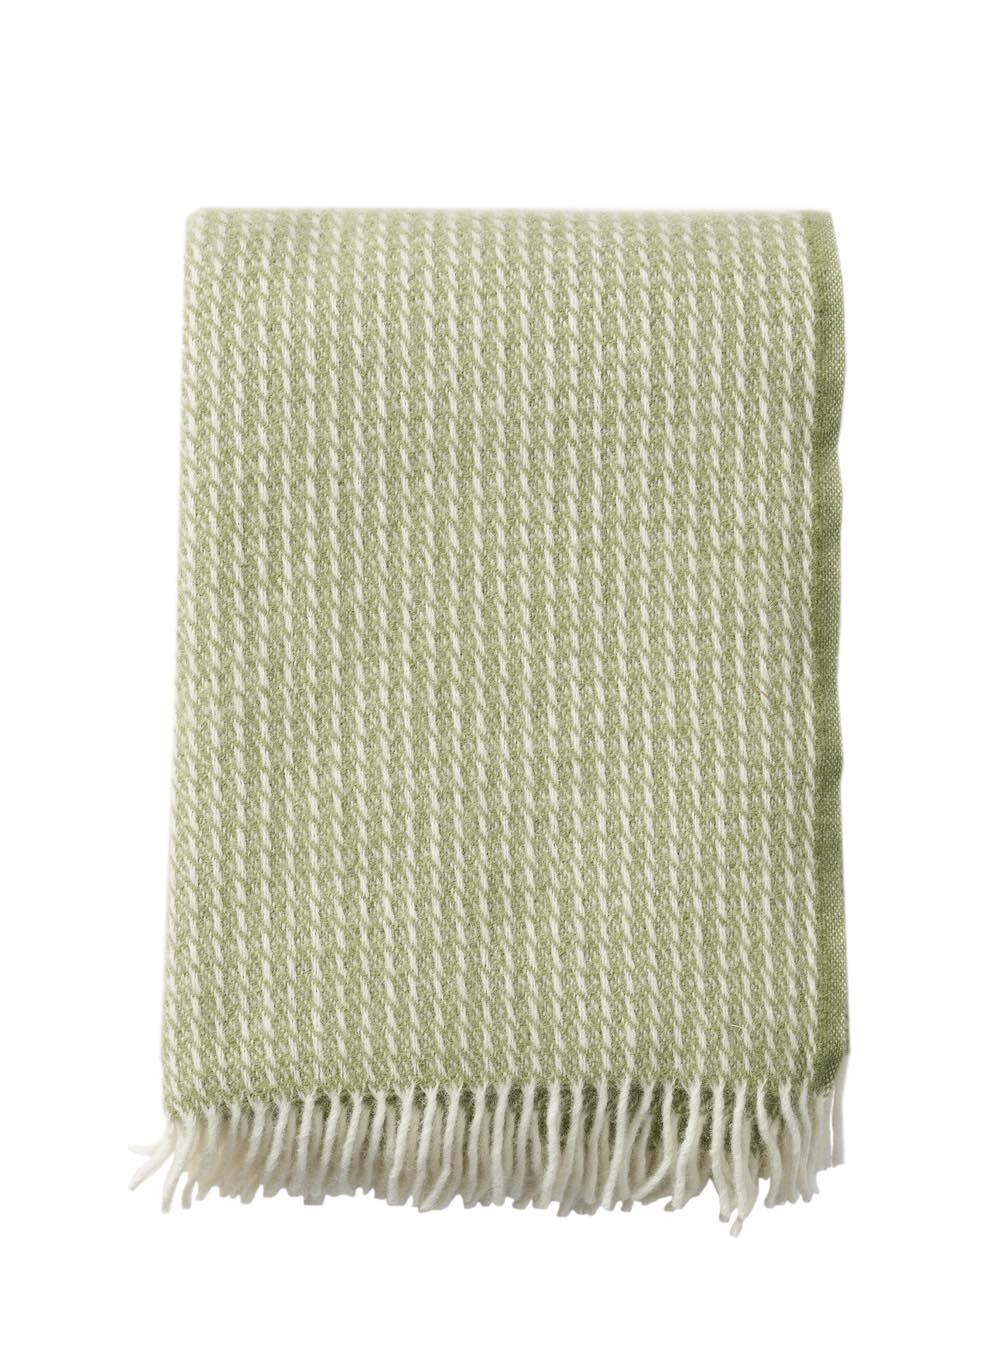 Line Green Blanket/Throw